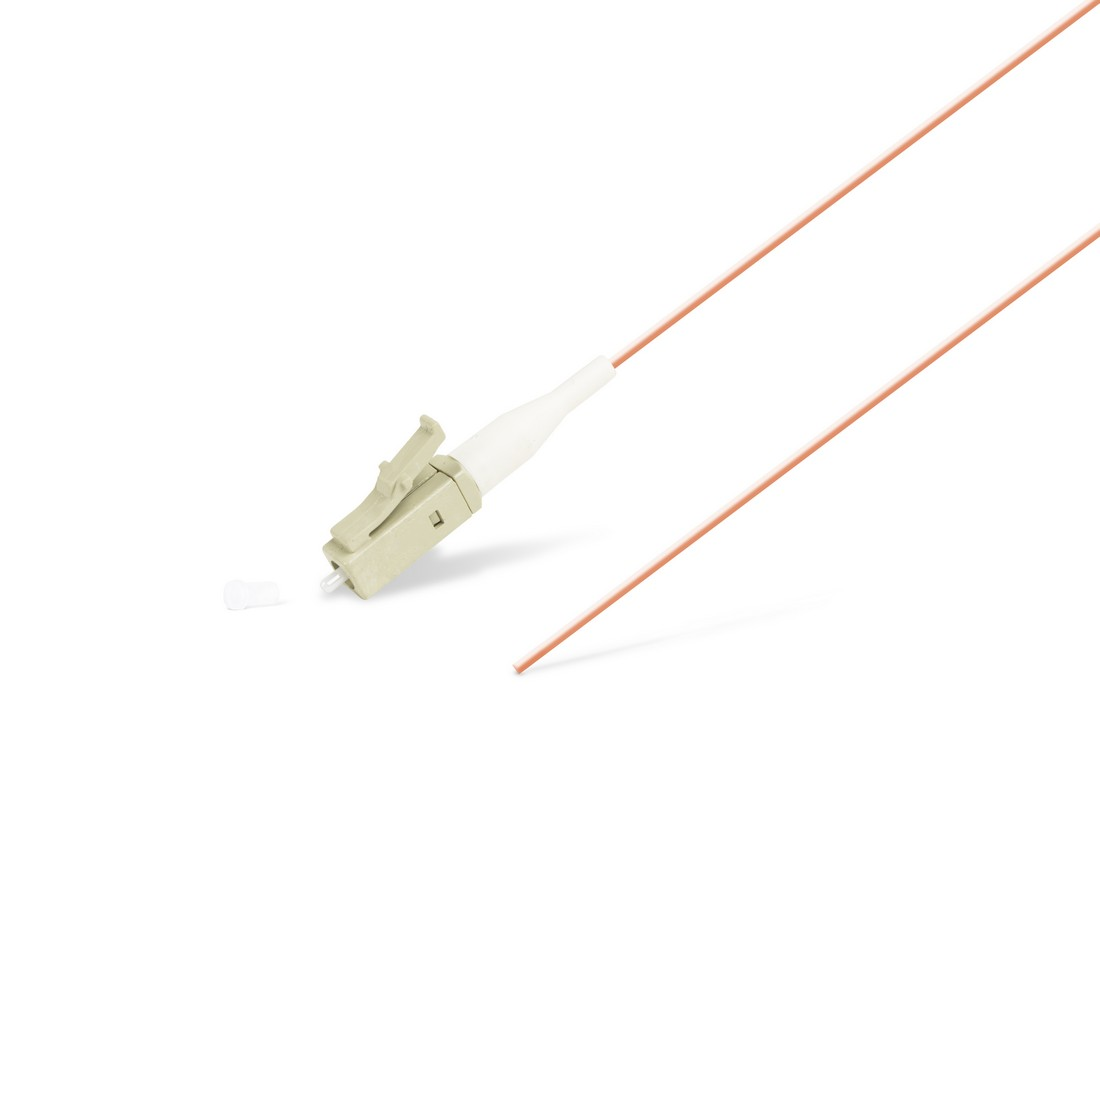 Пигтейл Оптический LC / UPC MM OM4 50 / 125 0.9мм 1.5 м